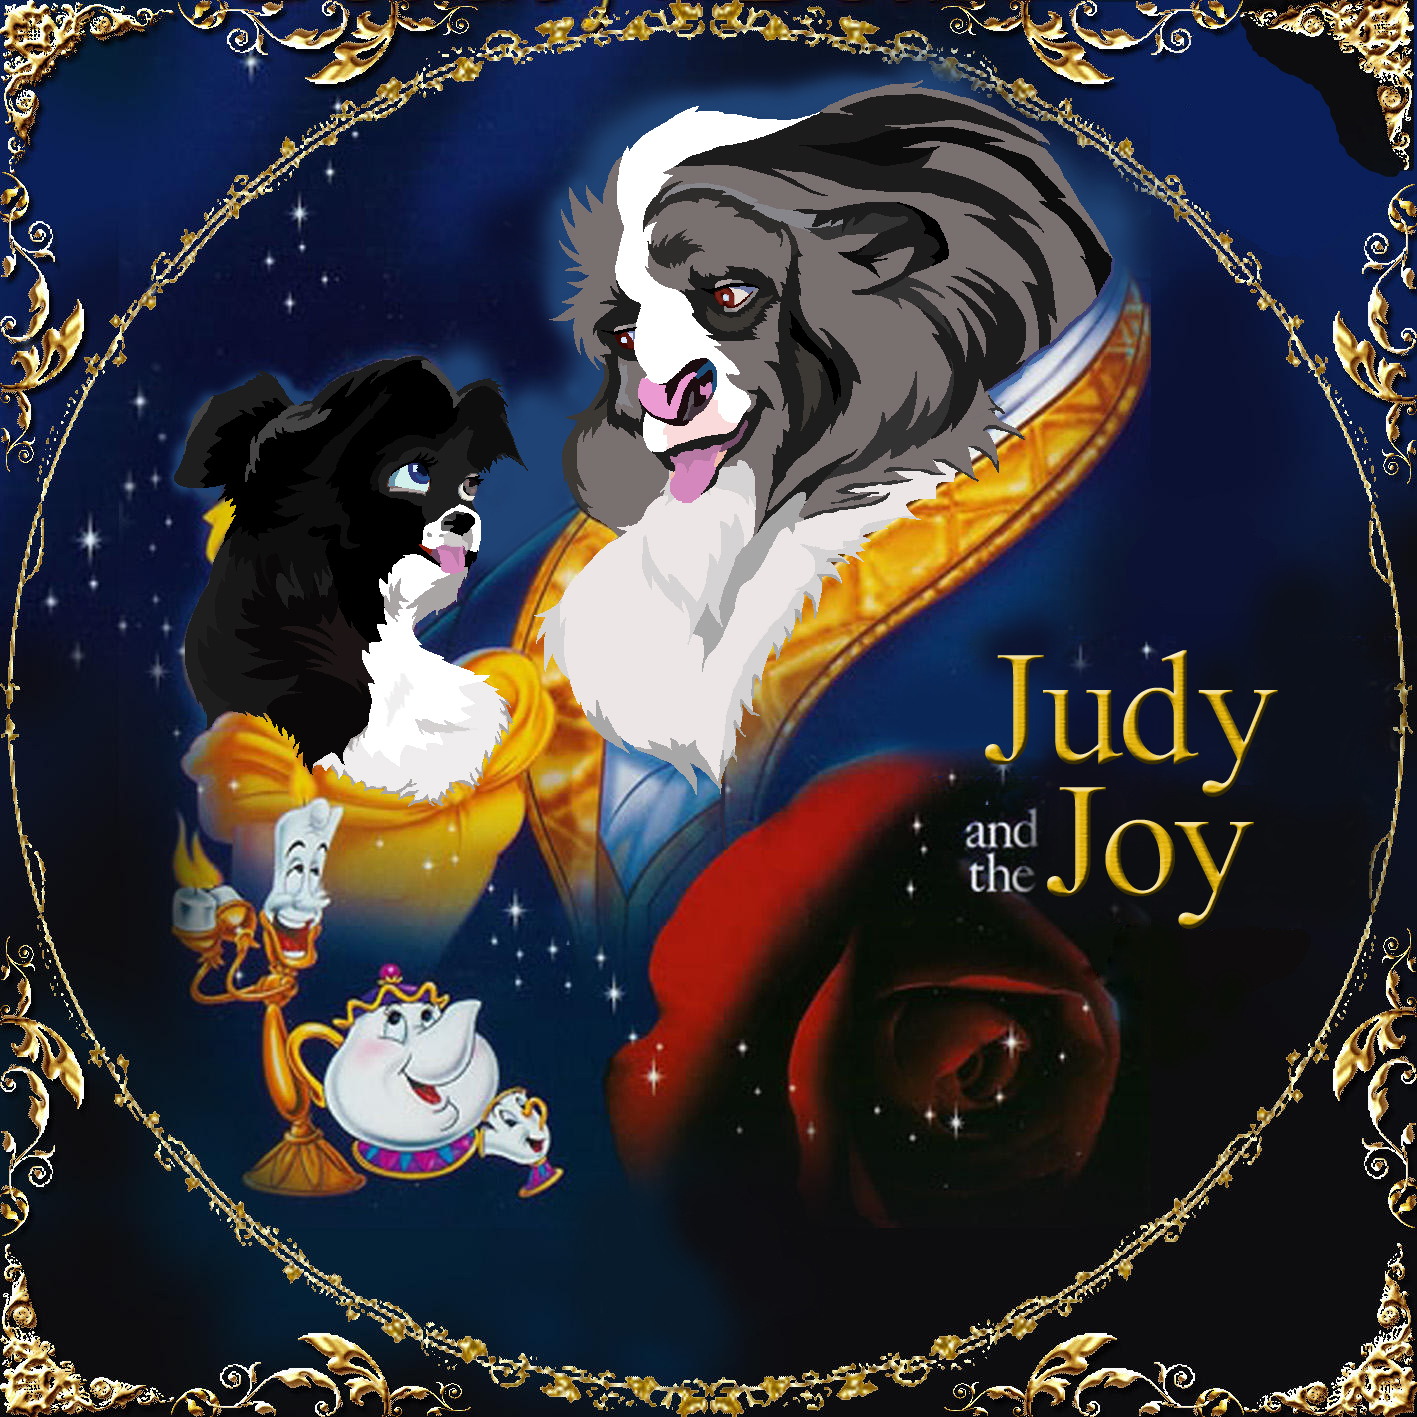 Judy-and-The-Joy.jpg